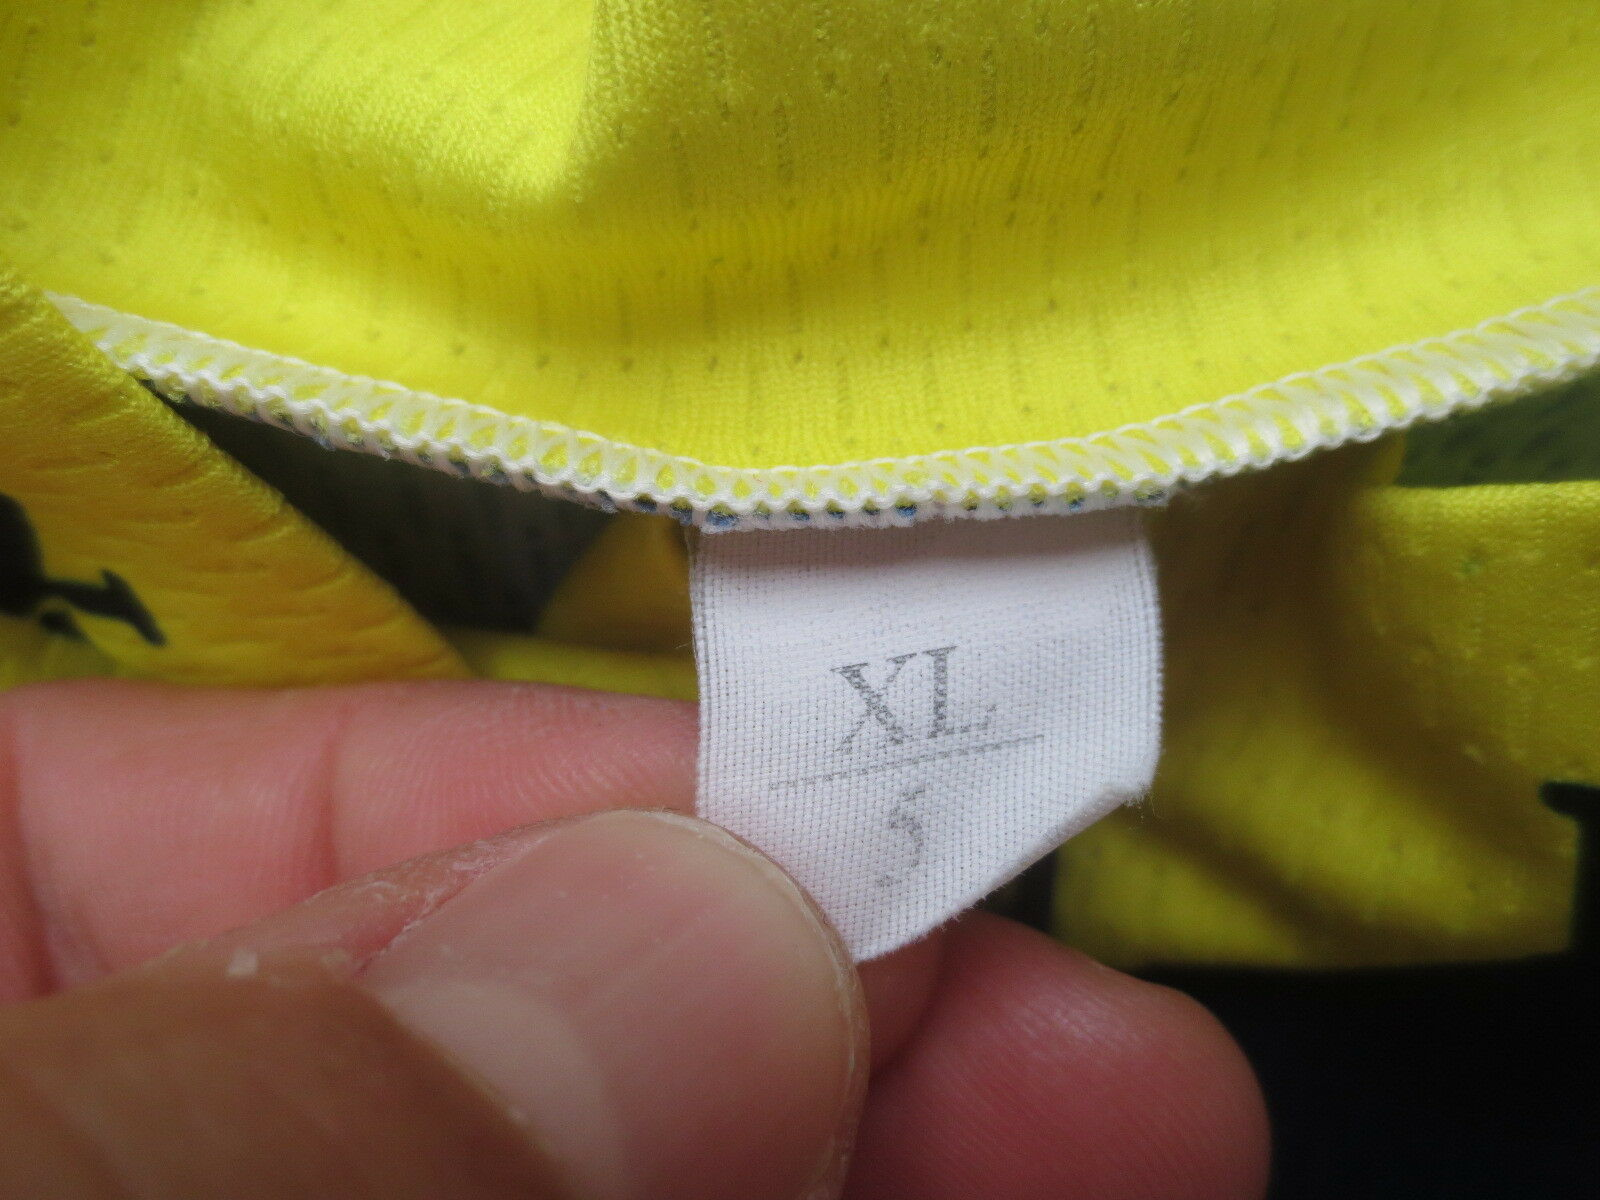 Maillot cycliste FESTINA LOTUS shirt Specialized Biemme 2000 trikot jersey shirt LOTUS XL 5 9f0fd6